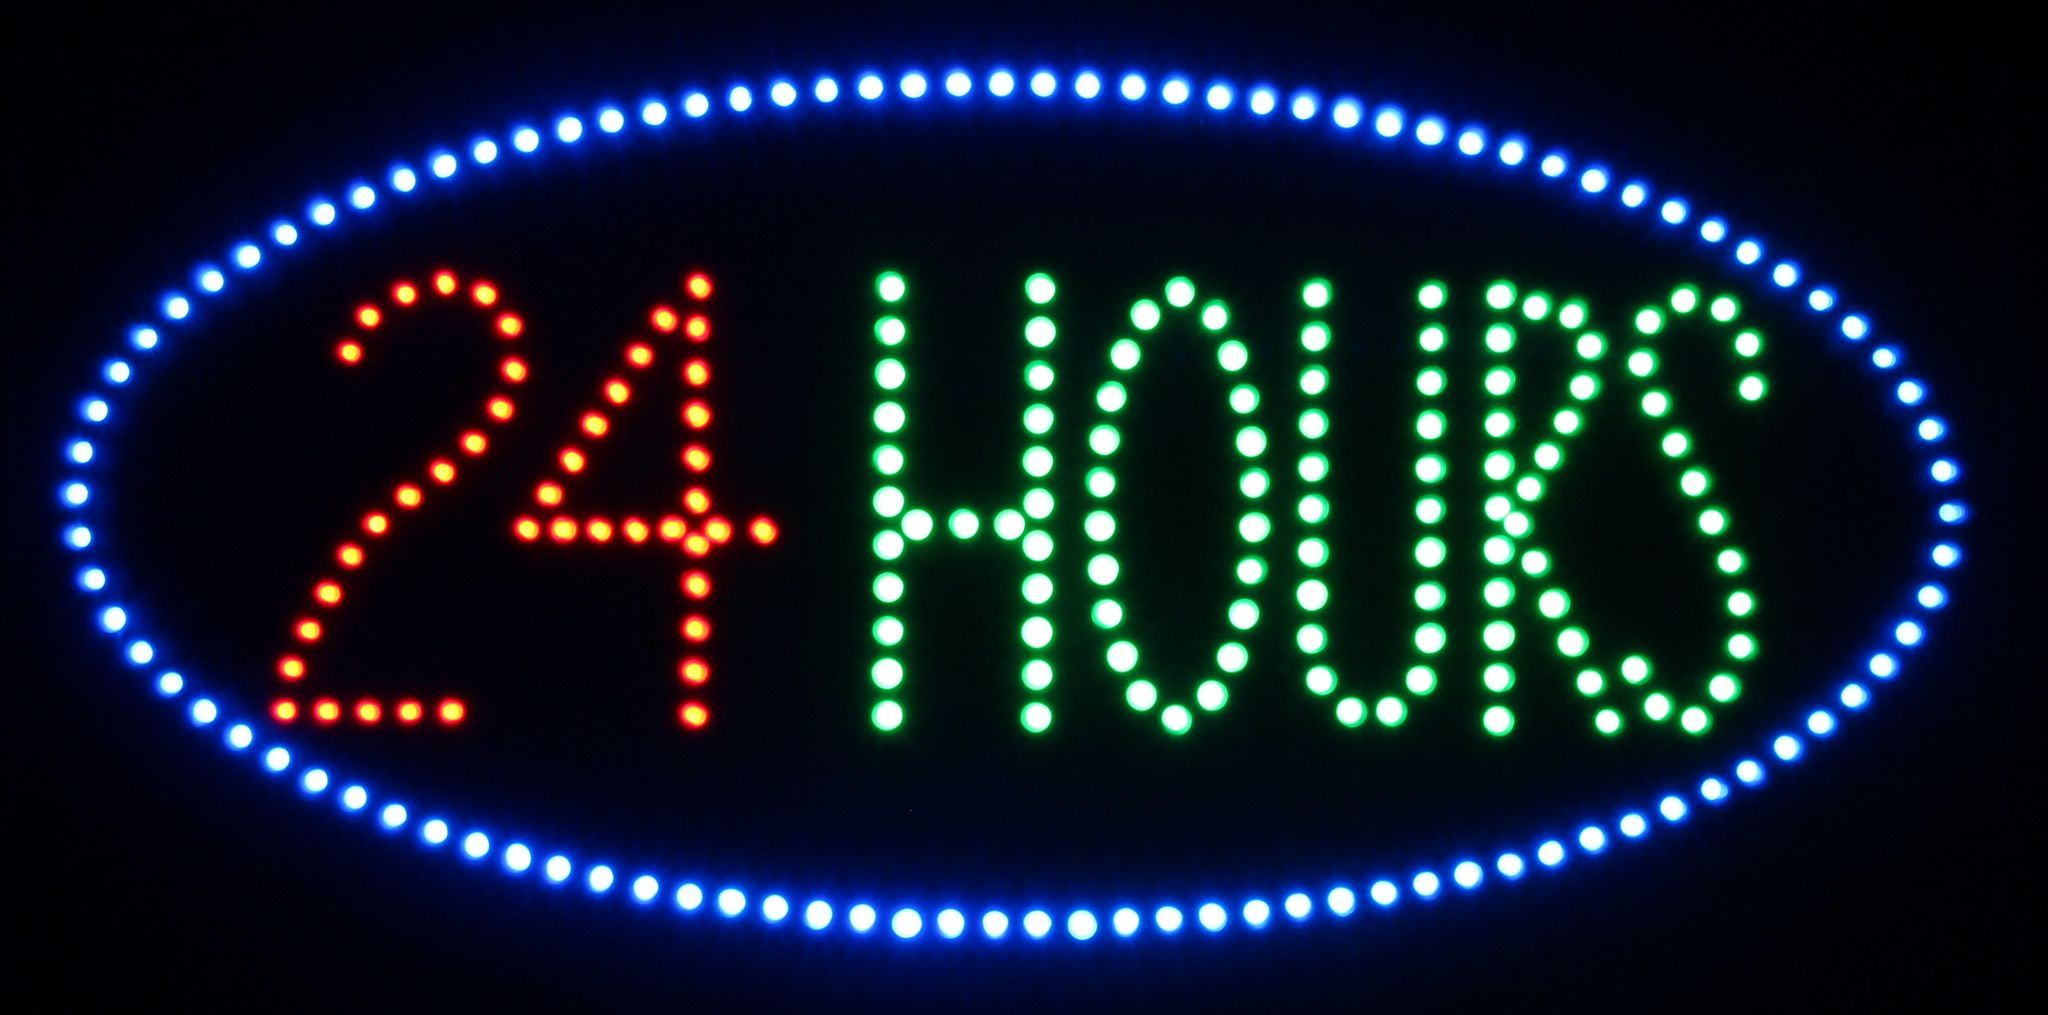 Open 24 Hours LED Sign Led signs, Open 24 hours, Led